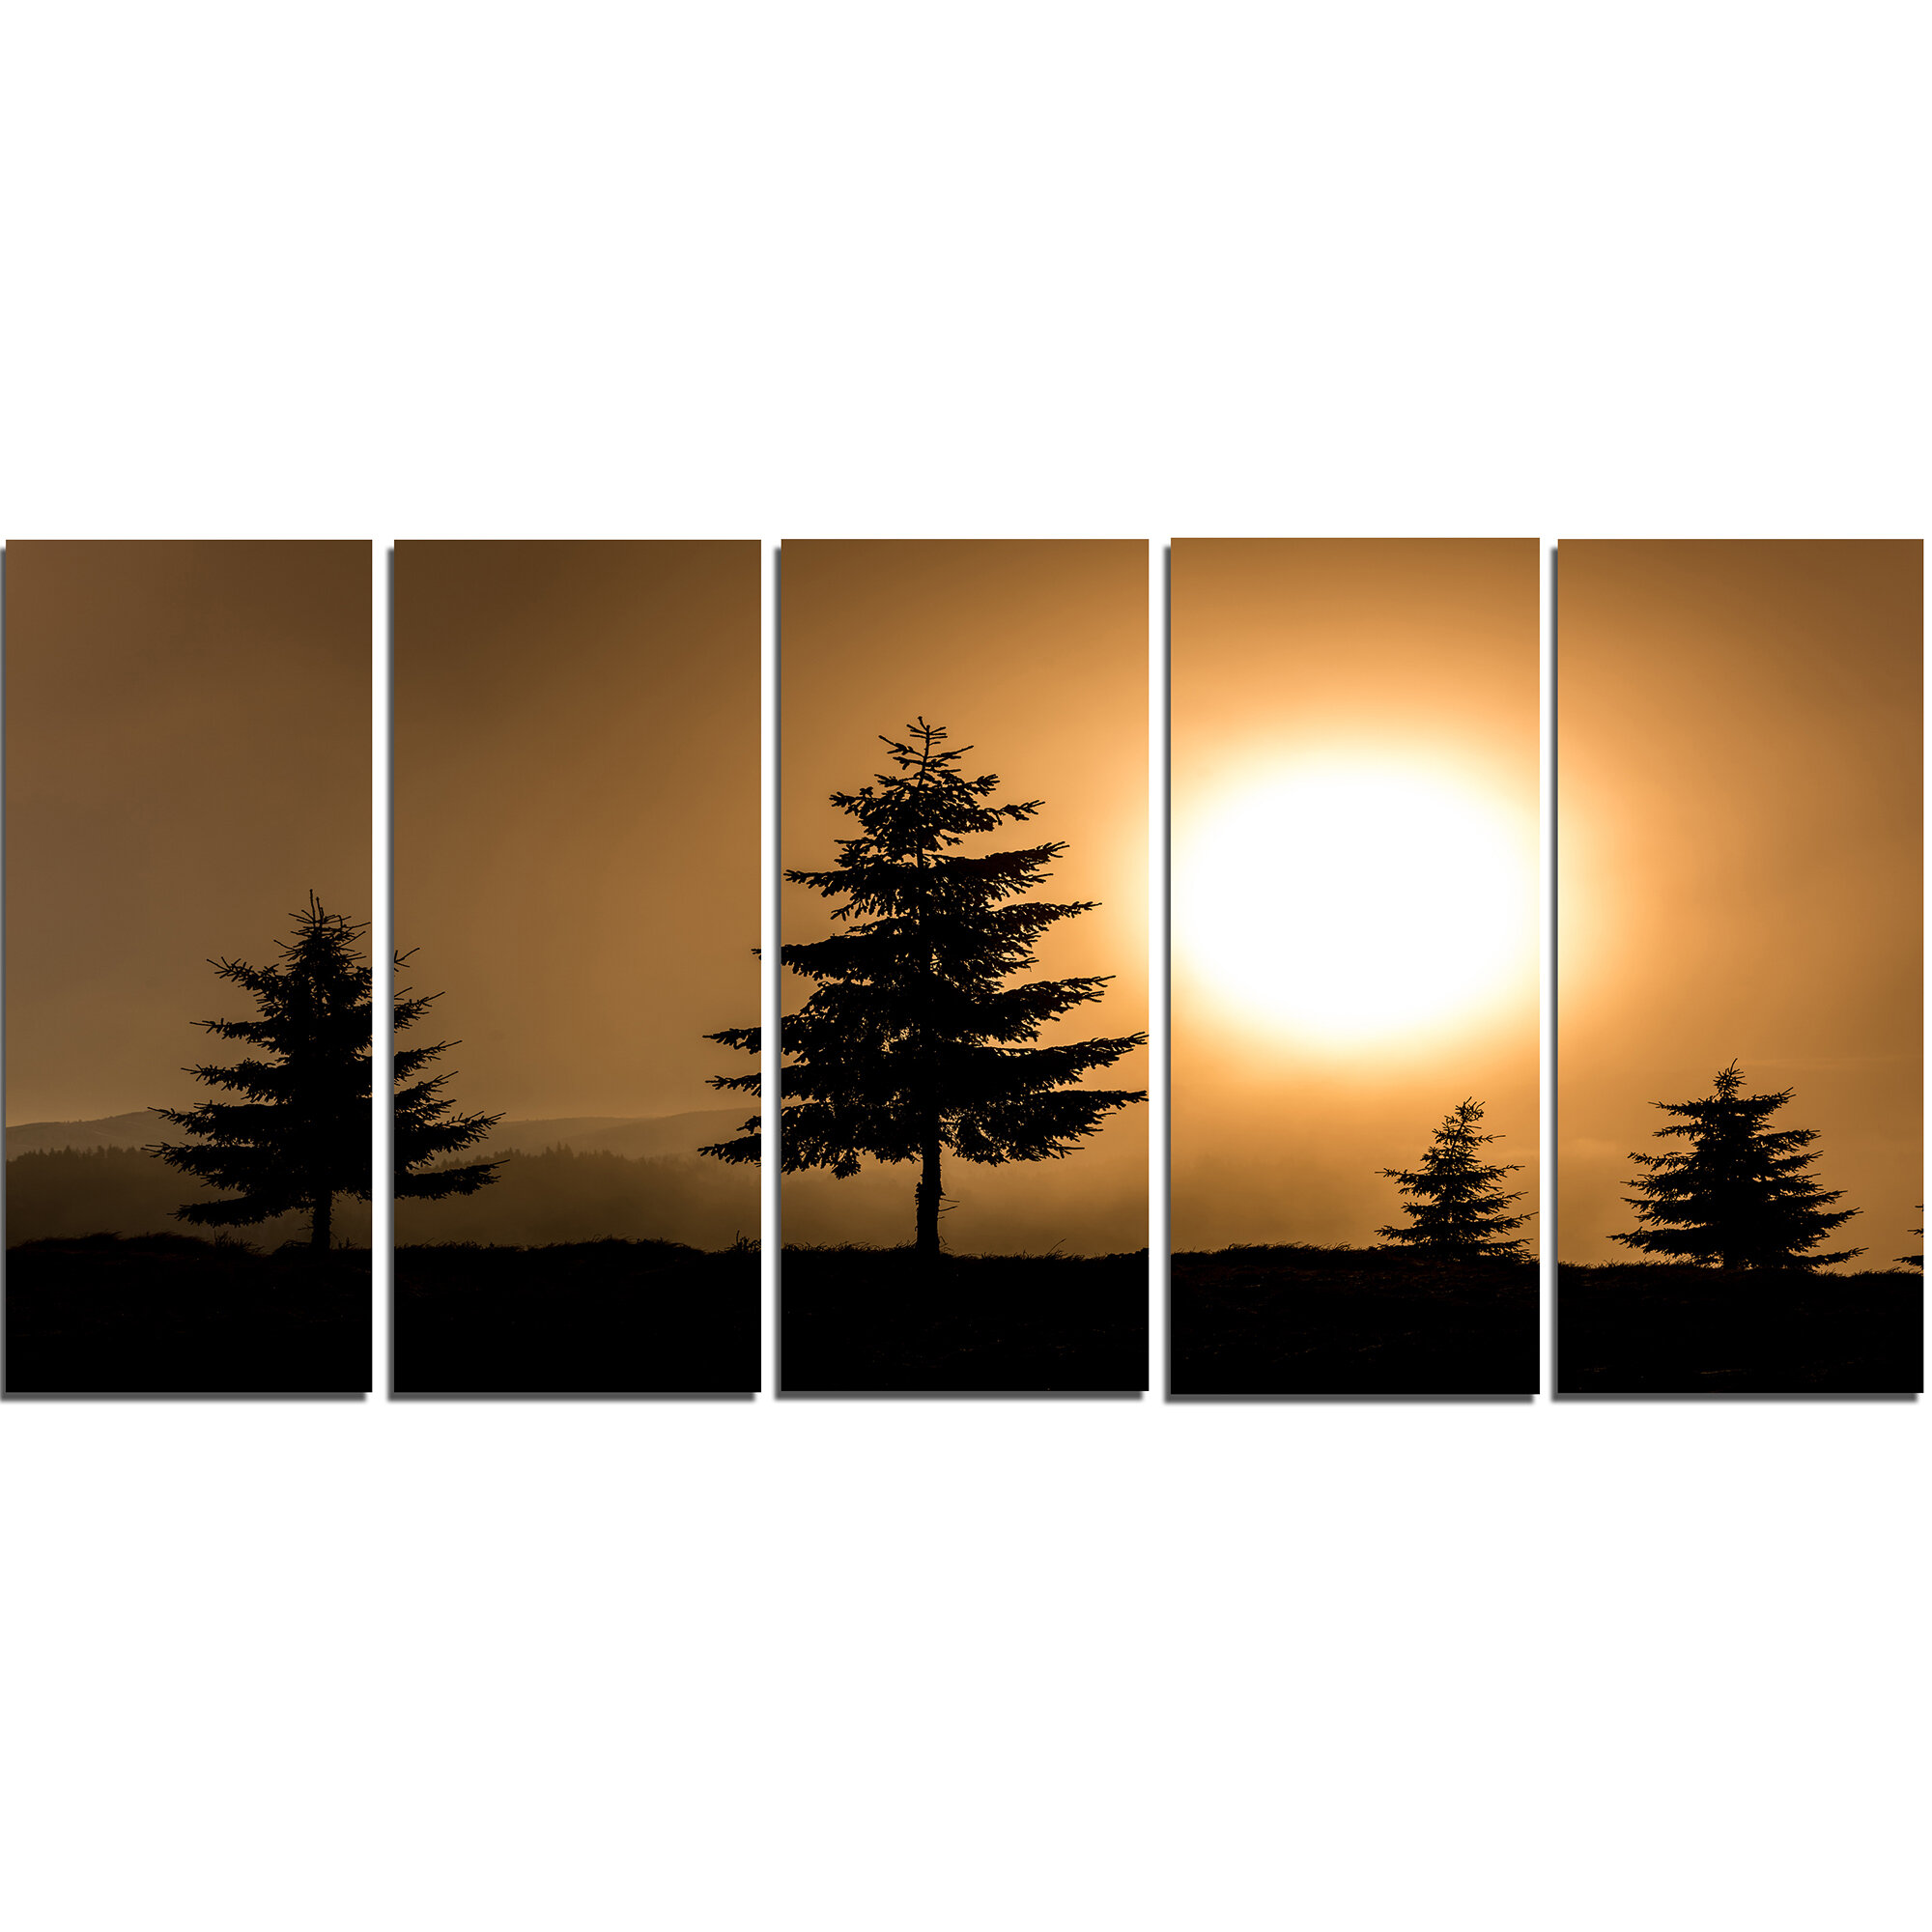 Designart Bright Sunrise Tree Silhouette 5 Piece Wall Art On Wrapped Canvas Set Wayfair